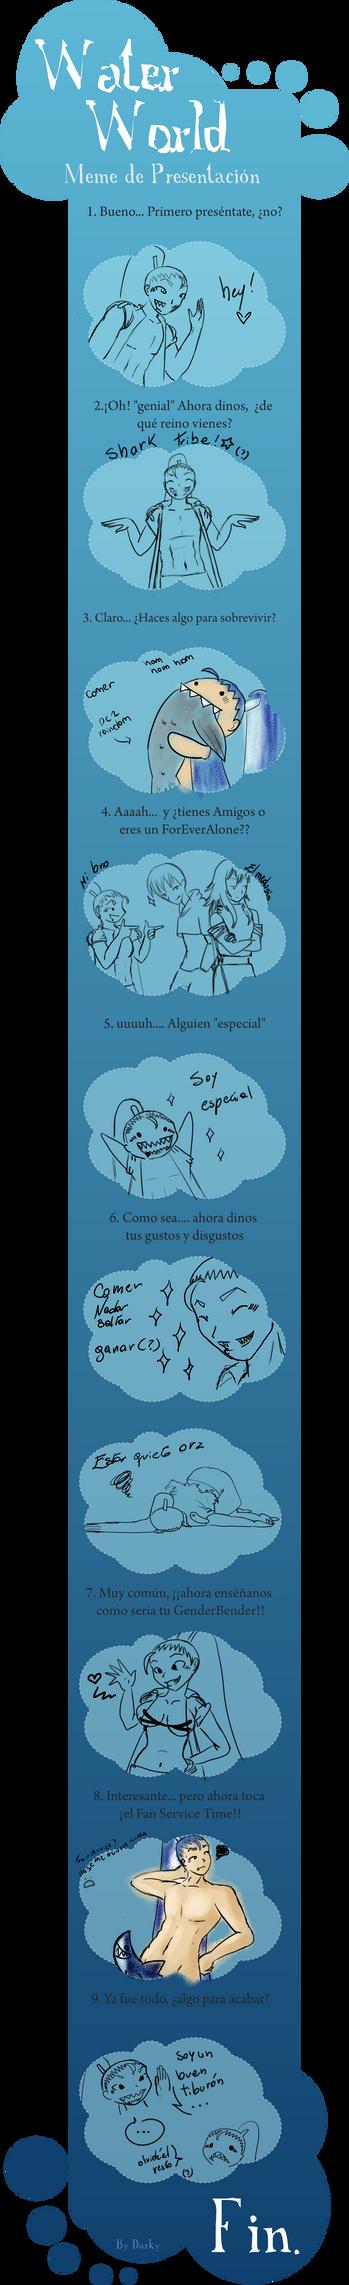 Wip meme de Mako by Kitsune-Furan